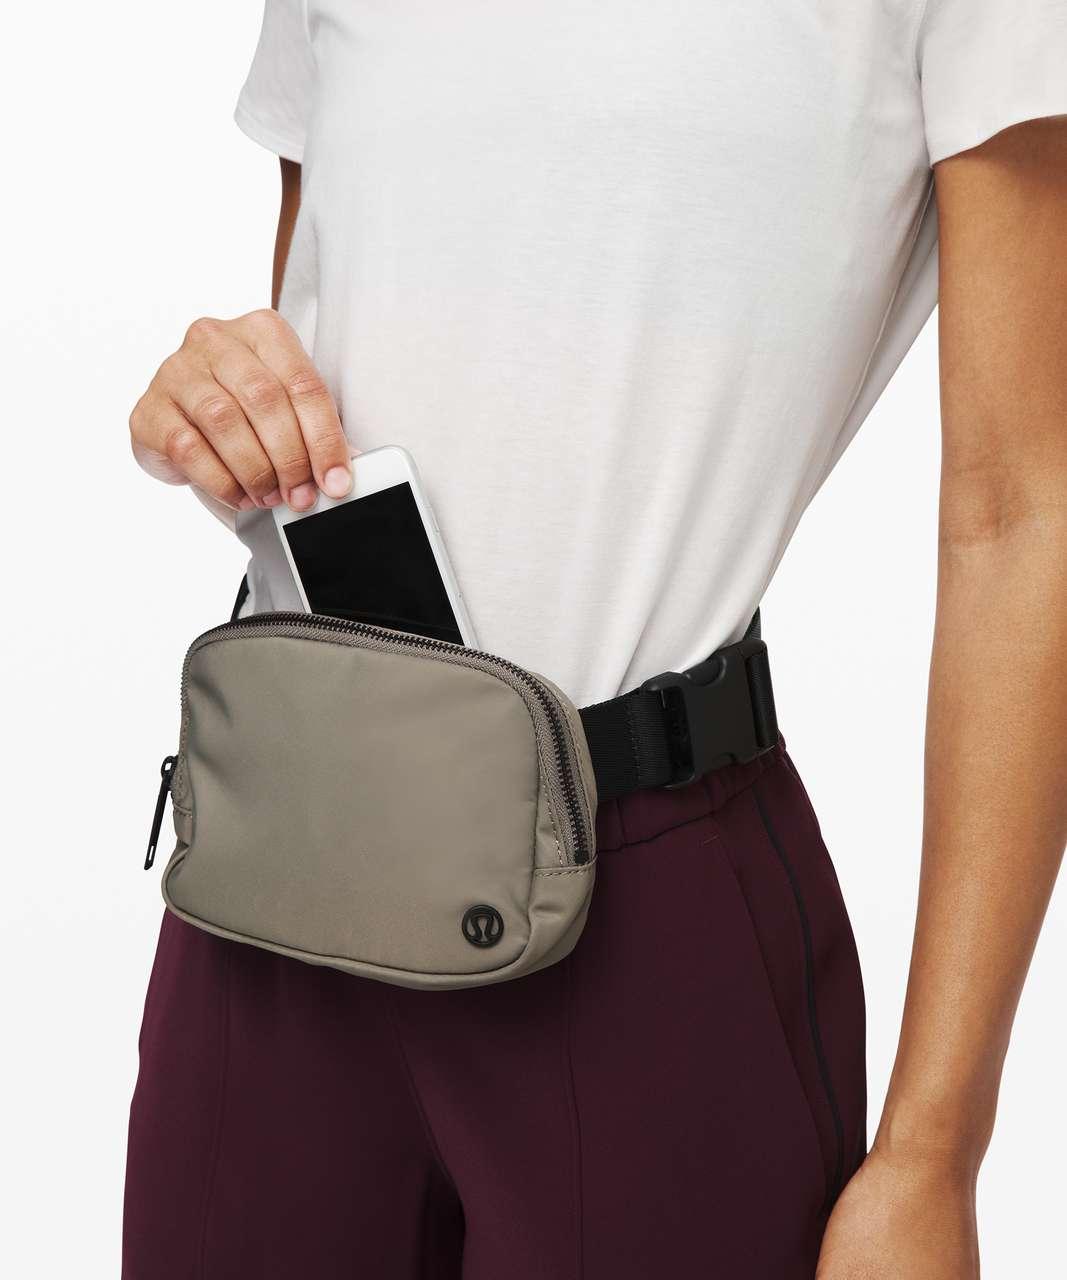 Lululemon Everywhere Belt Bag *1L - Carbon Dust / Black